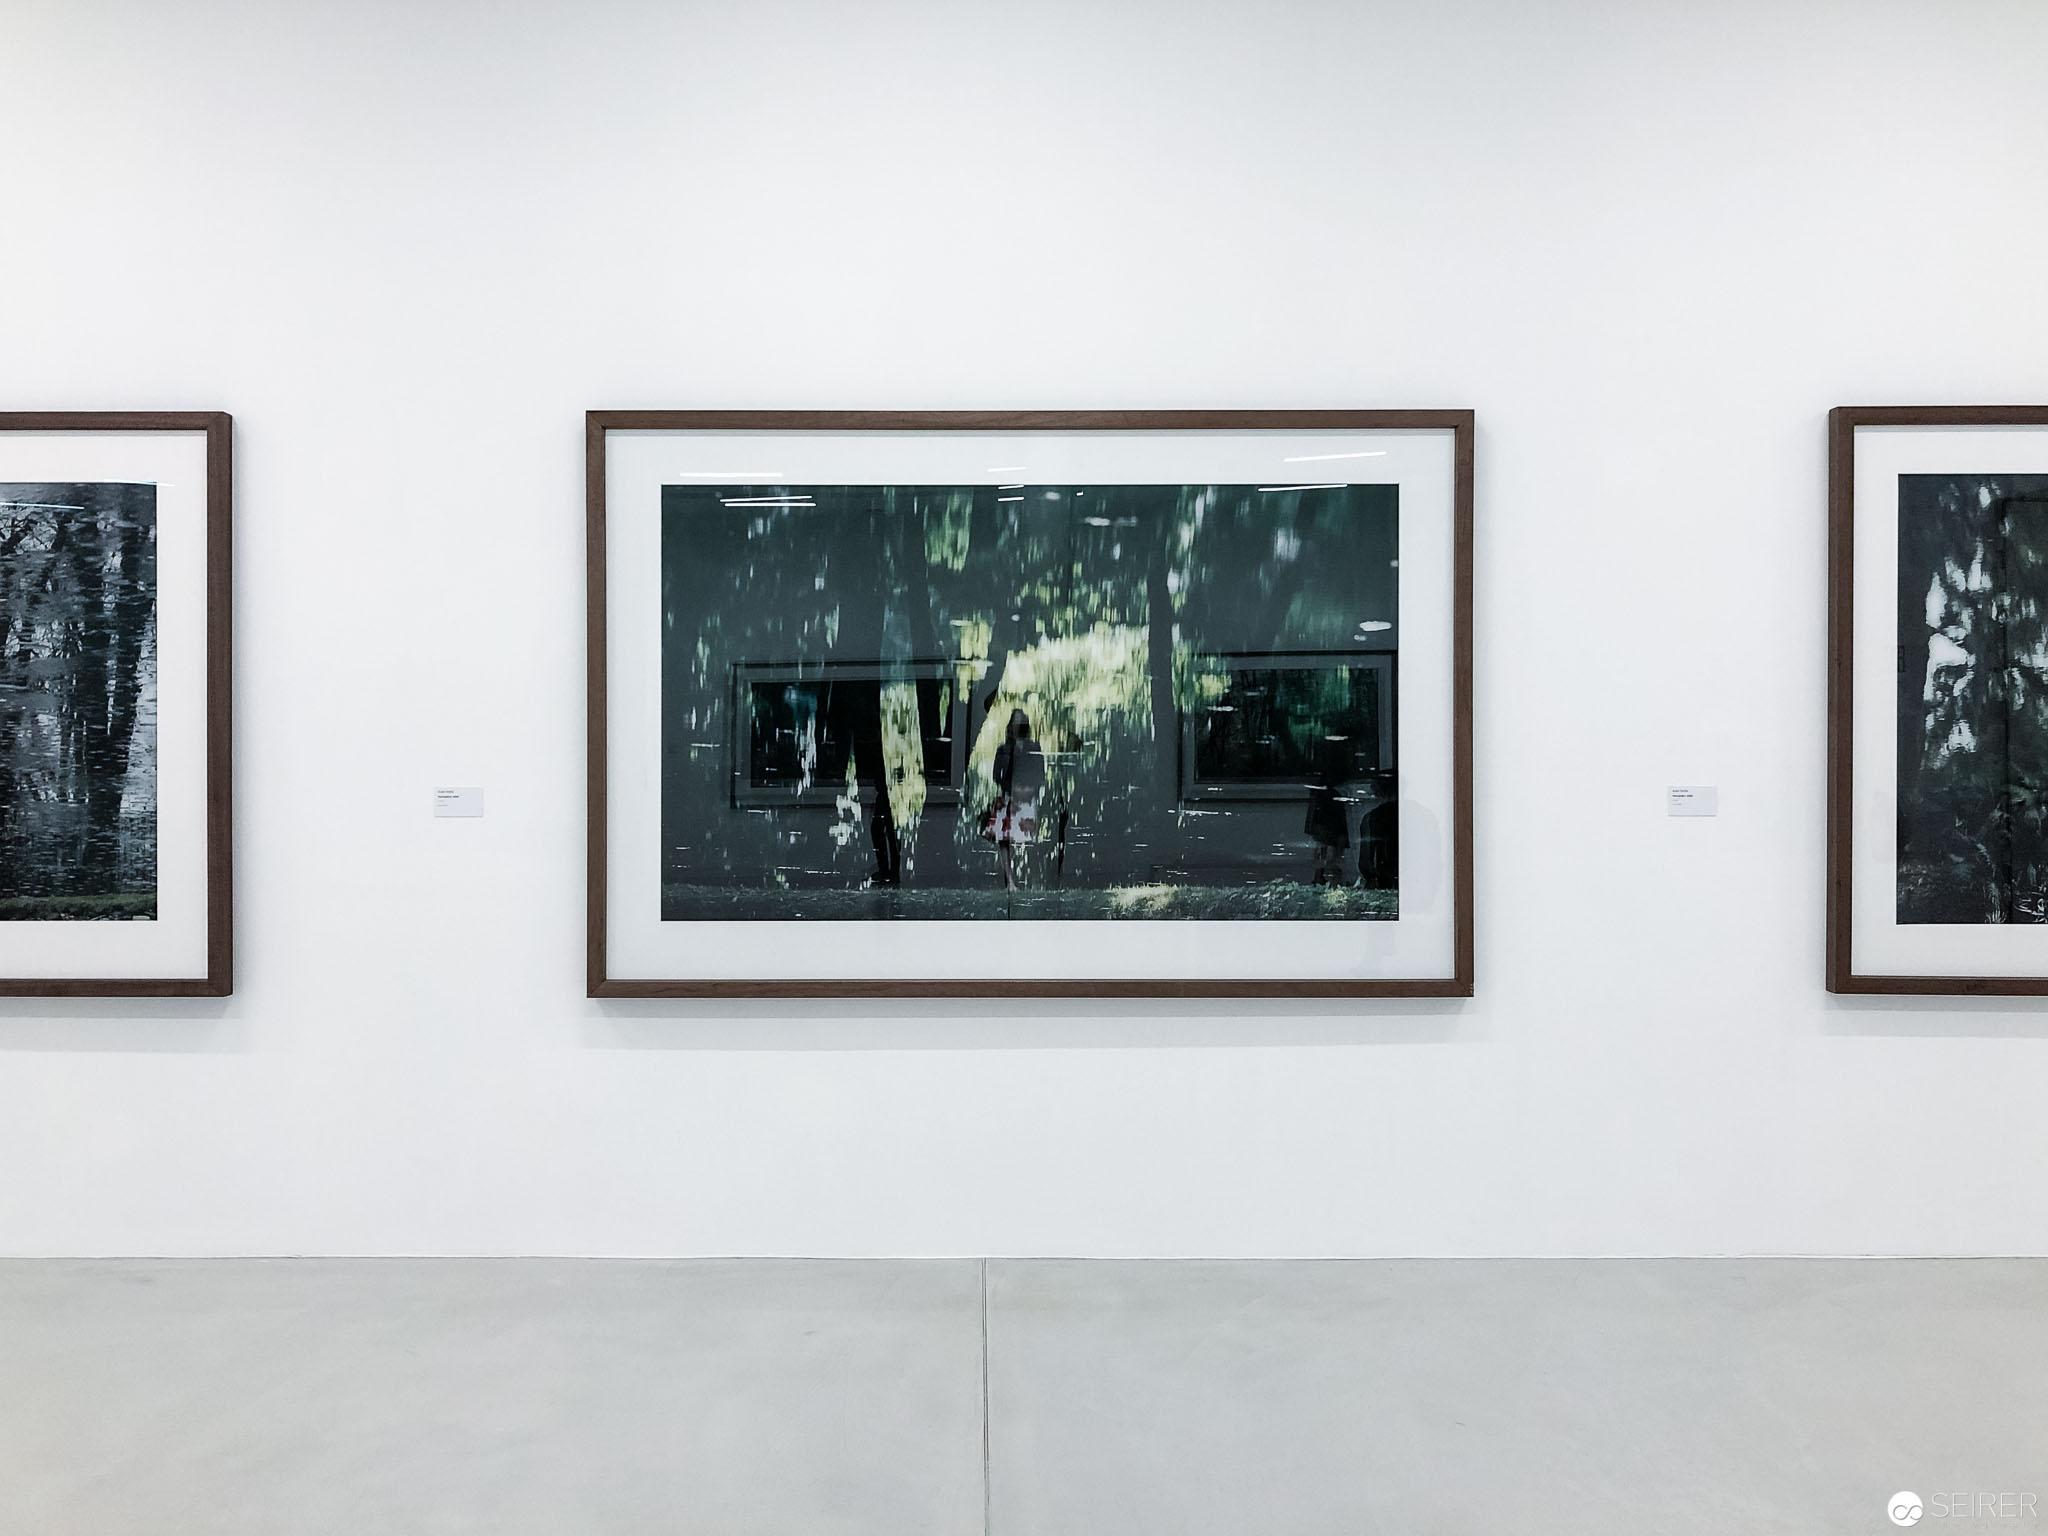 Imperial, Majestic und Magical - Axel Hütte in der Kunsthalle Krems